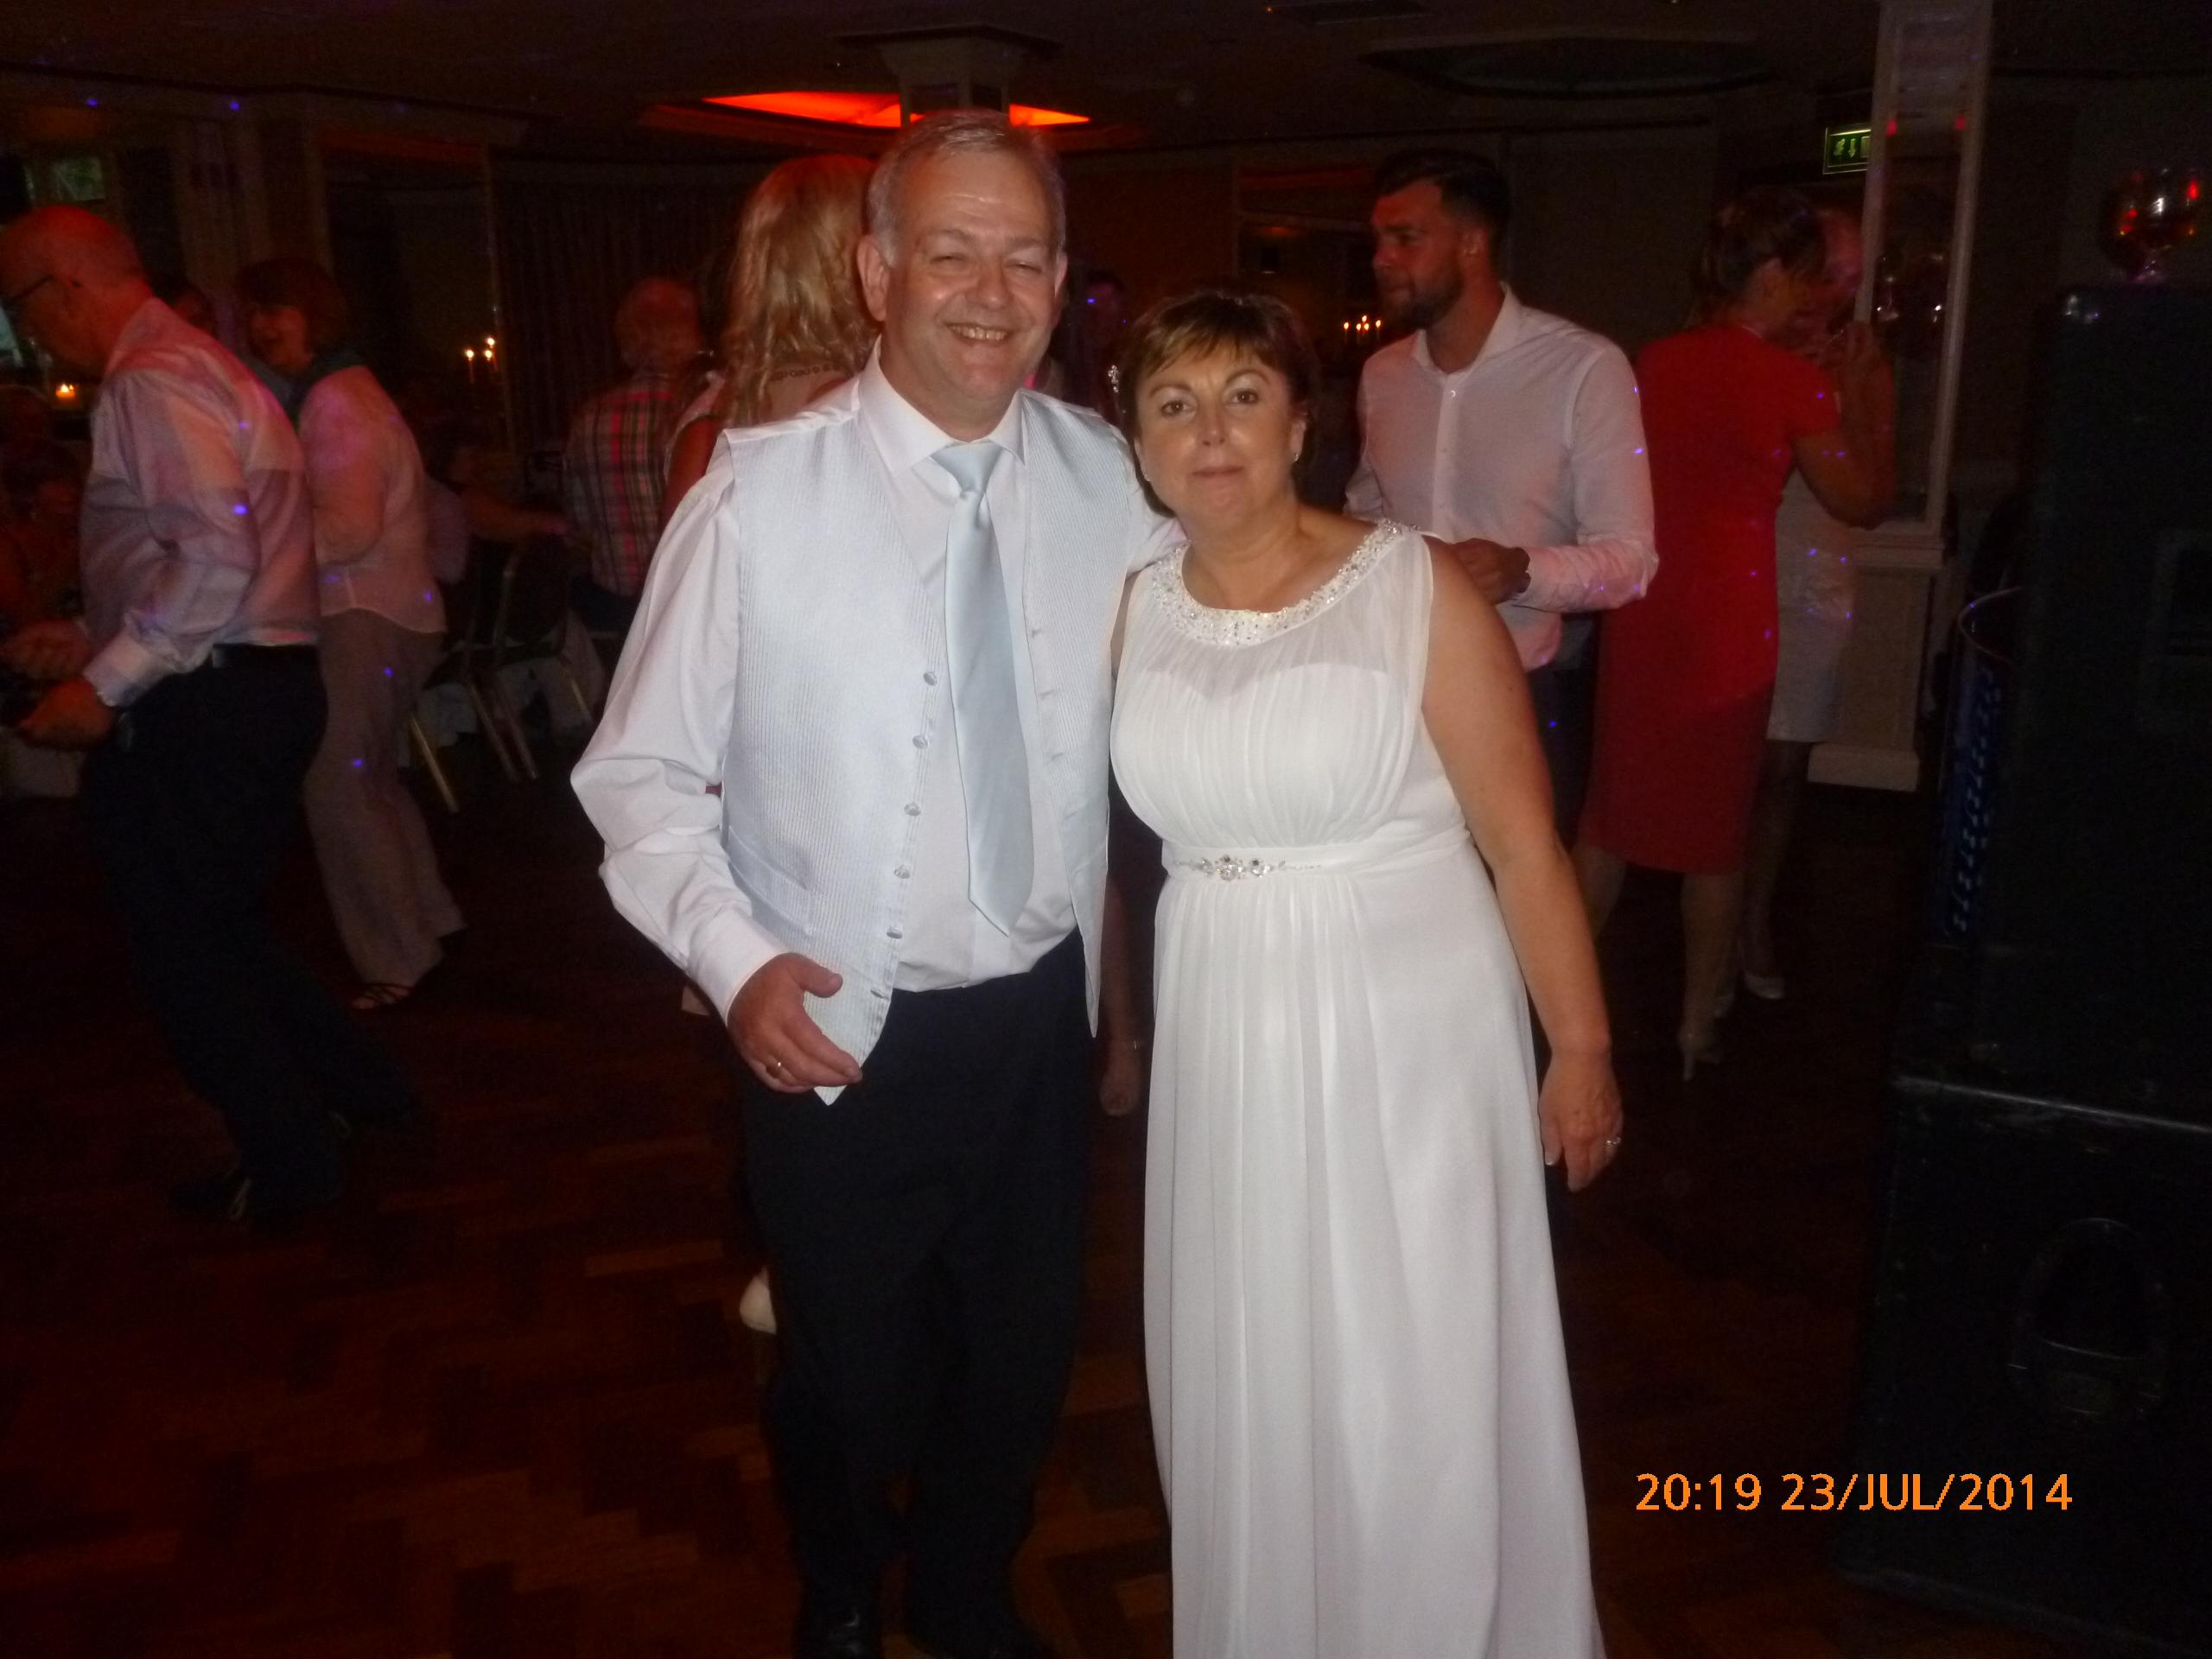 Stephen & Beryl the Happy Couple AR